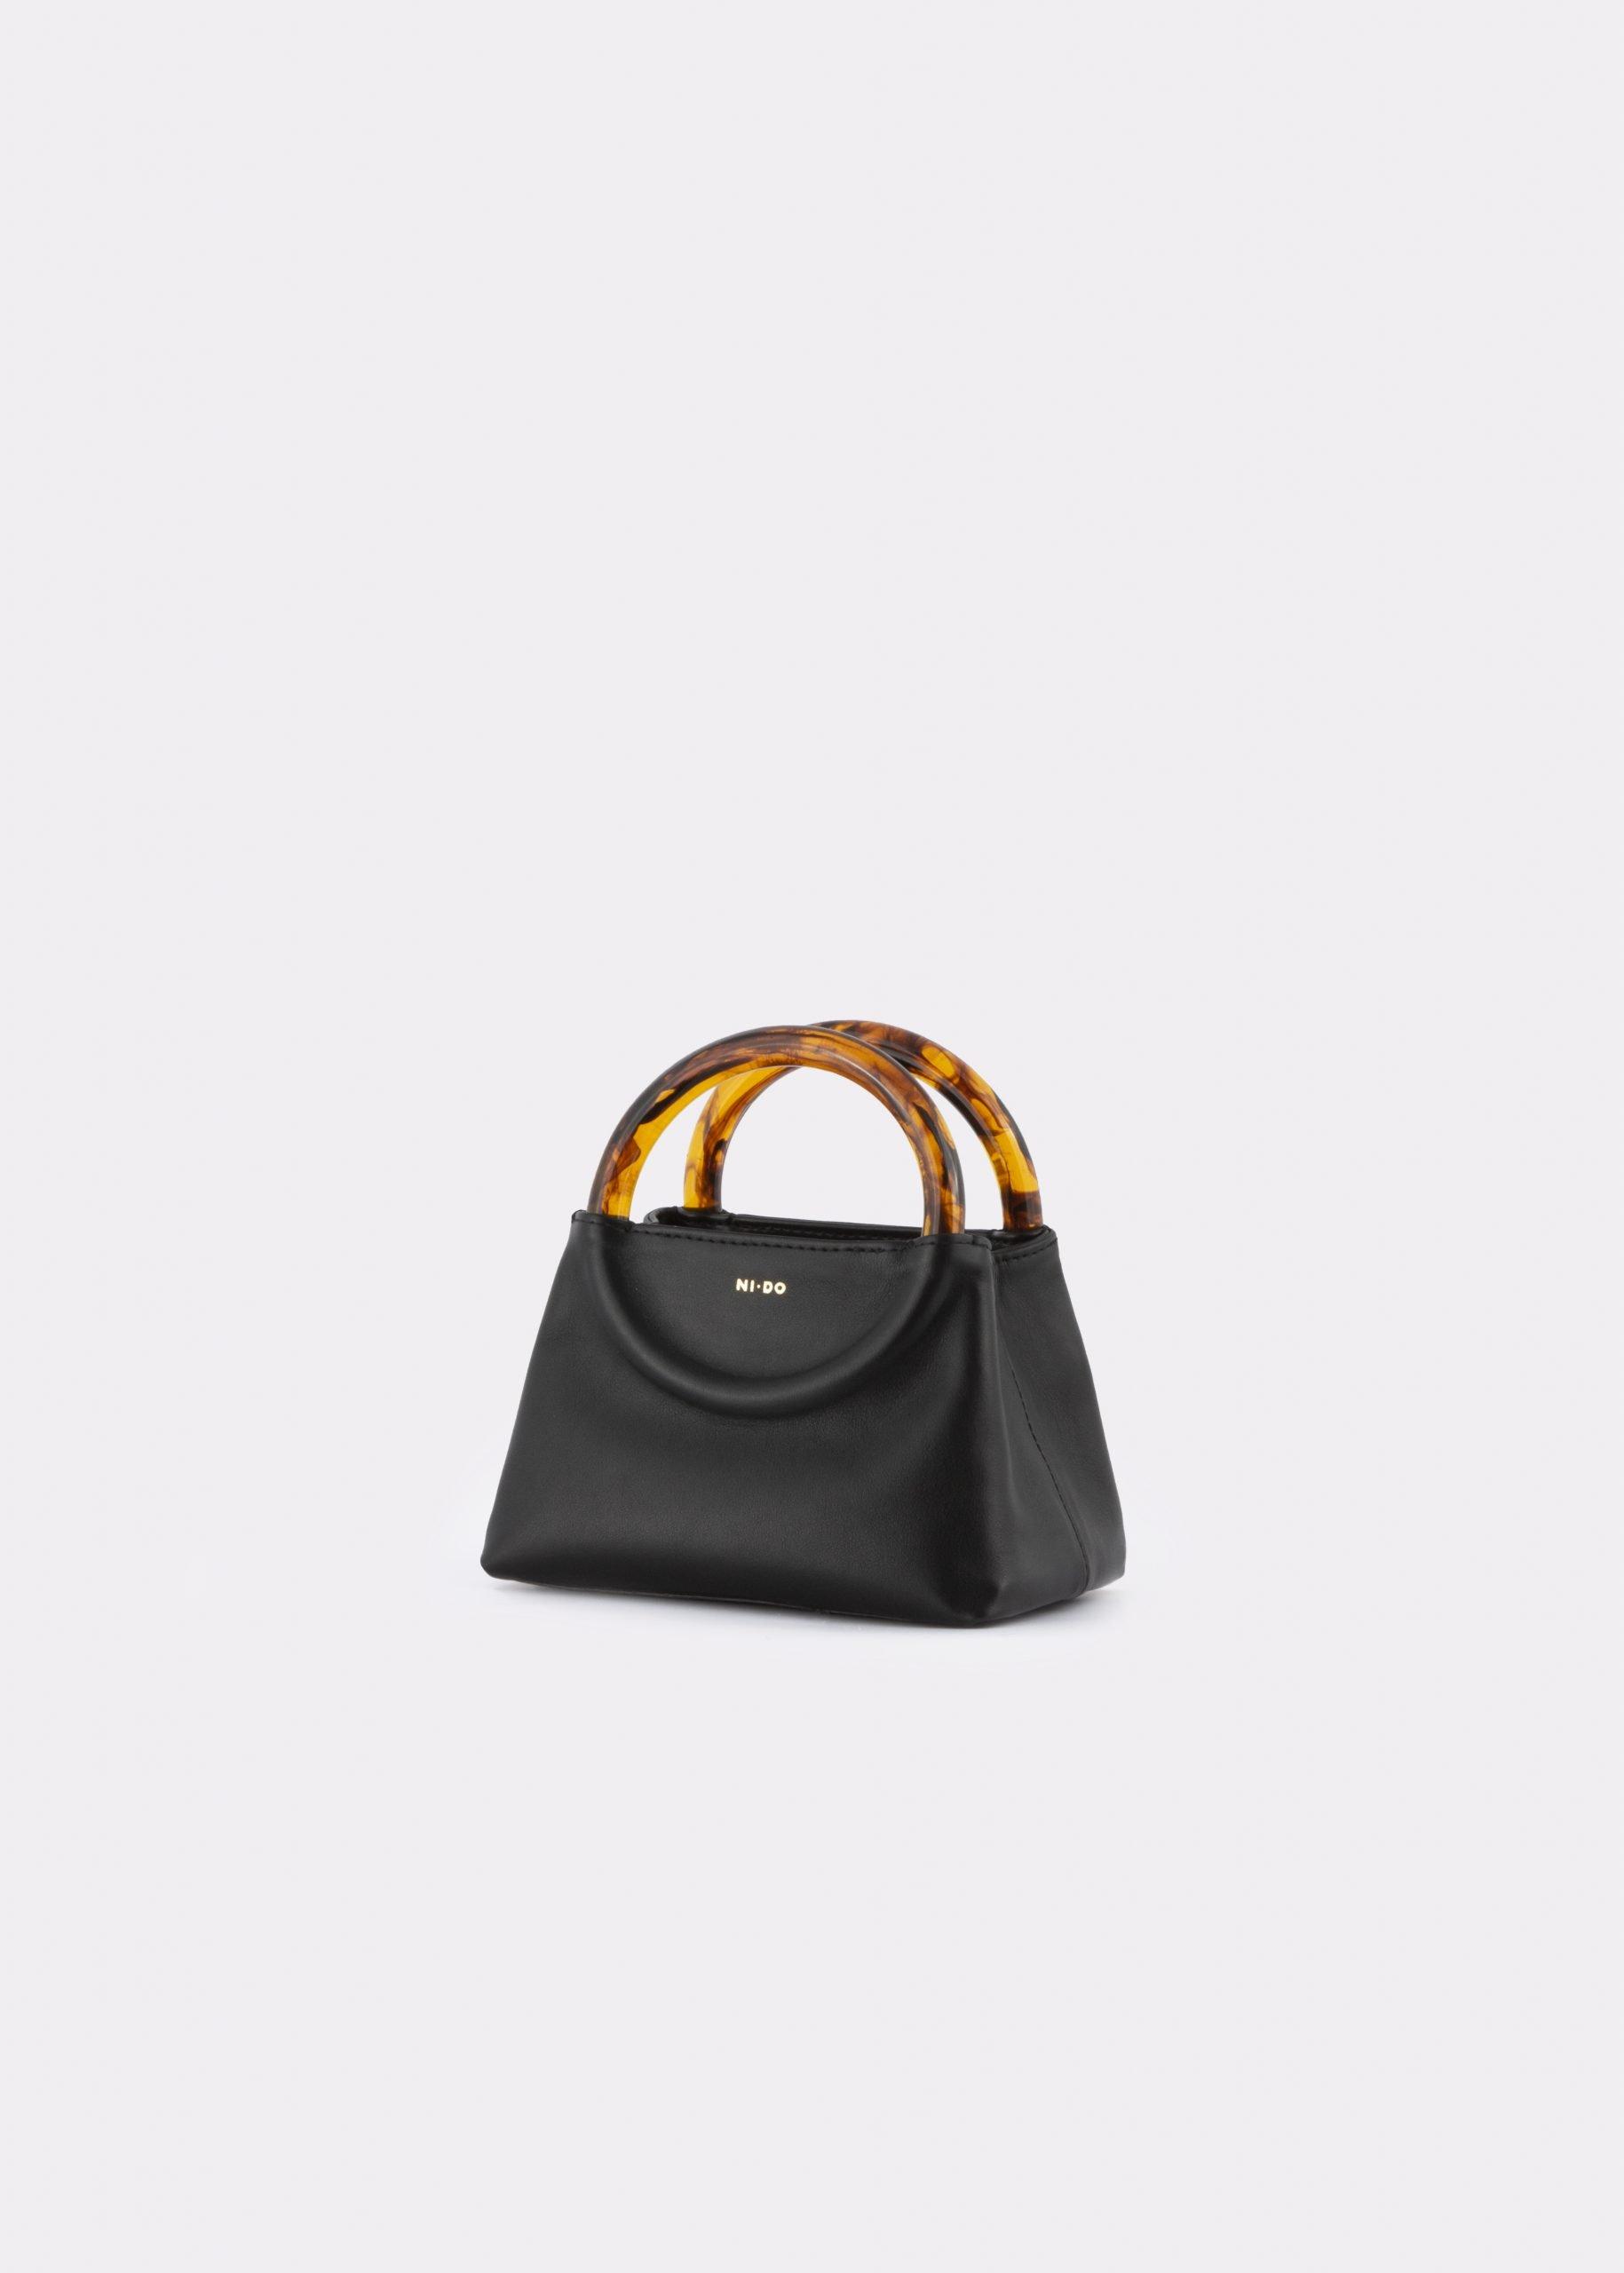 NIDO Bolla Micro bag black leather Amber_side view